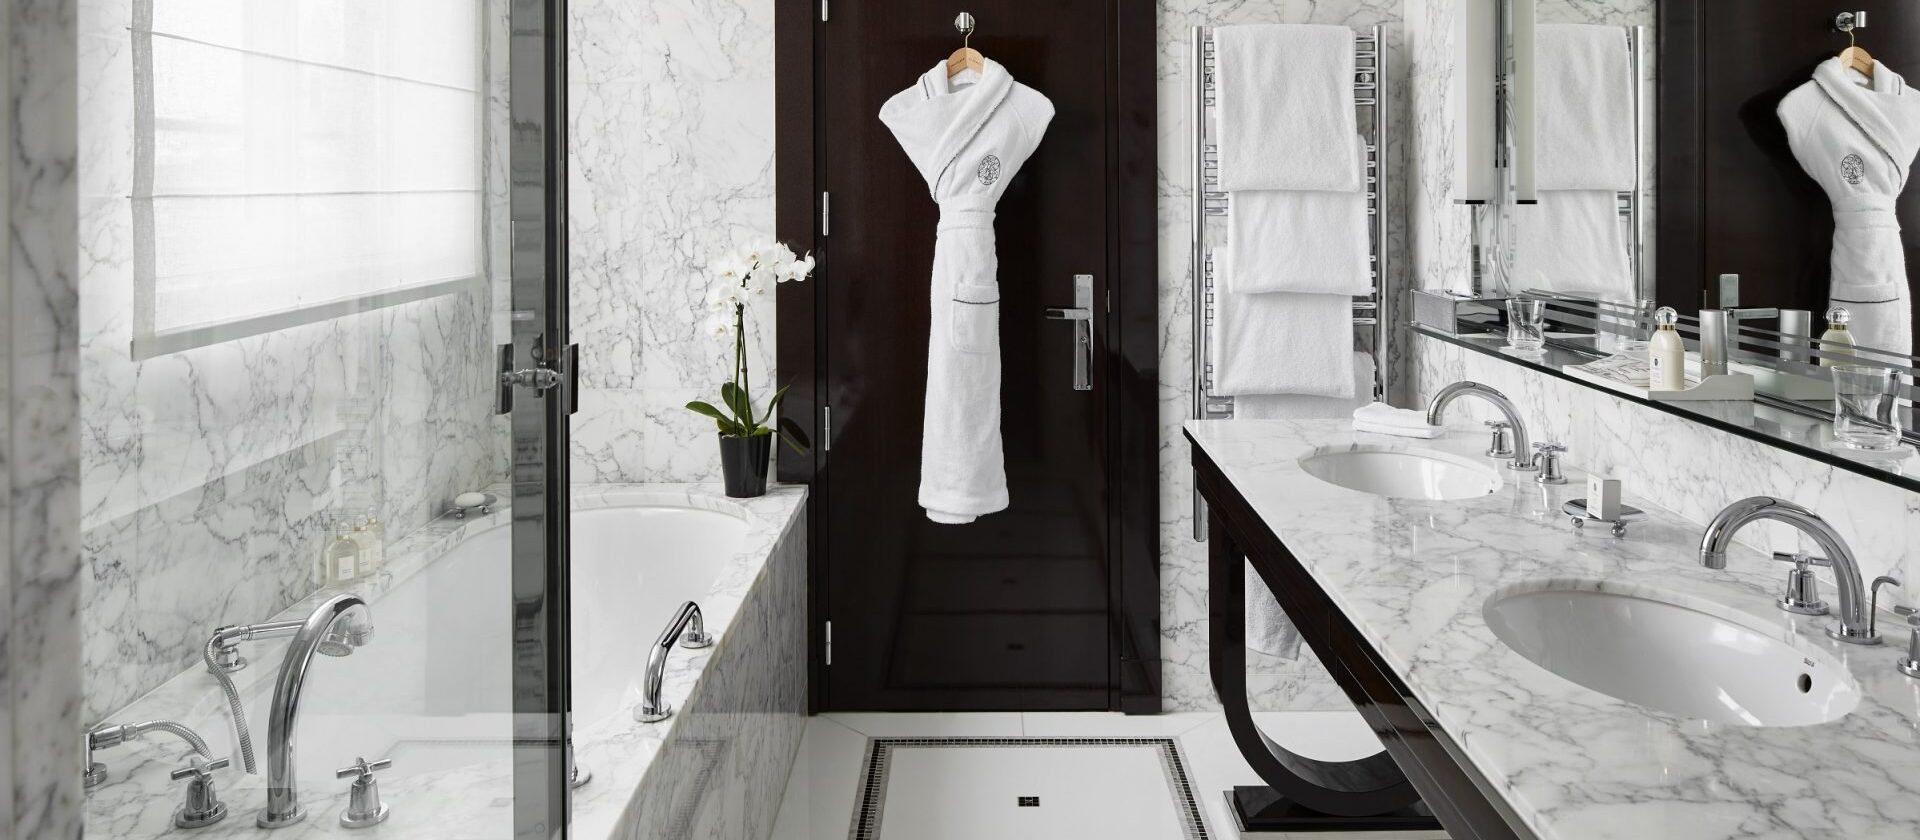 l 39 appartement paris h tel plaza ath n e dorchester. Black Bedroom Furniture Sets. Home Design Ideas